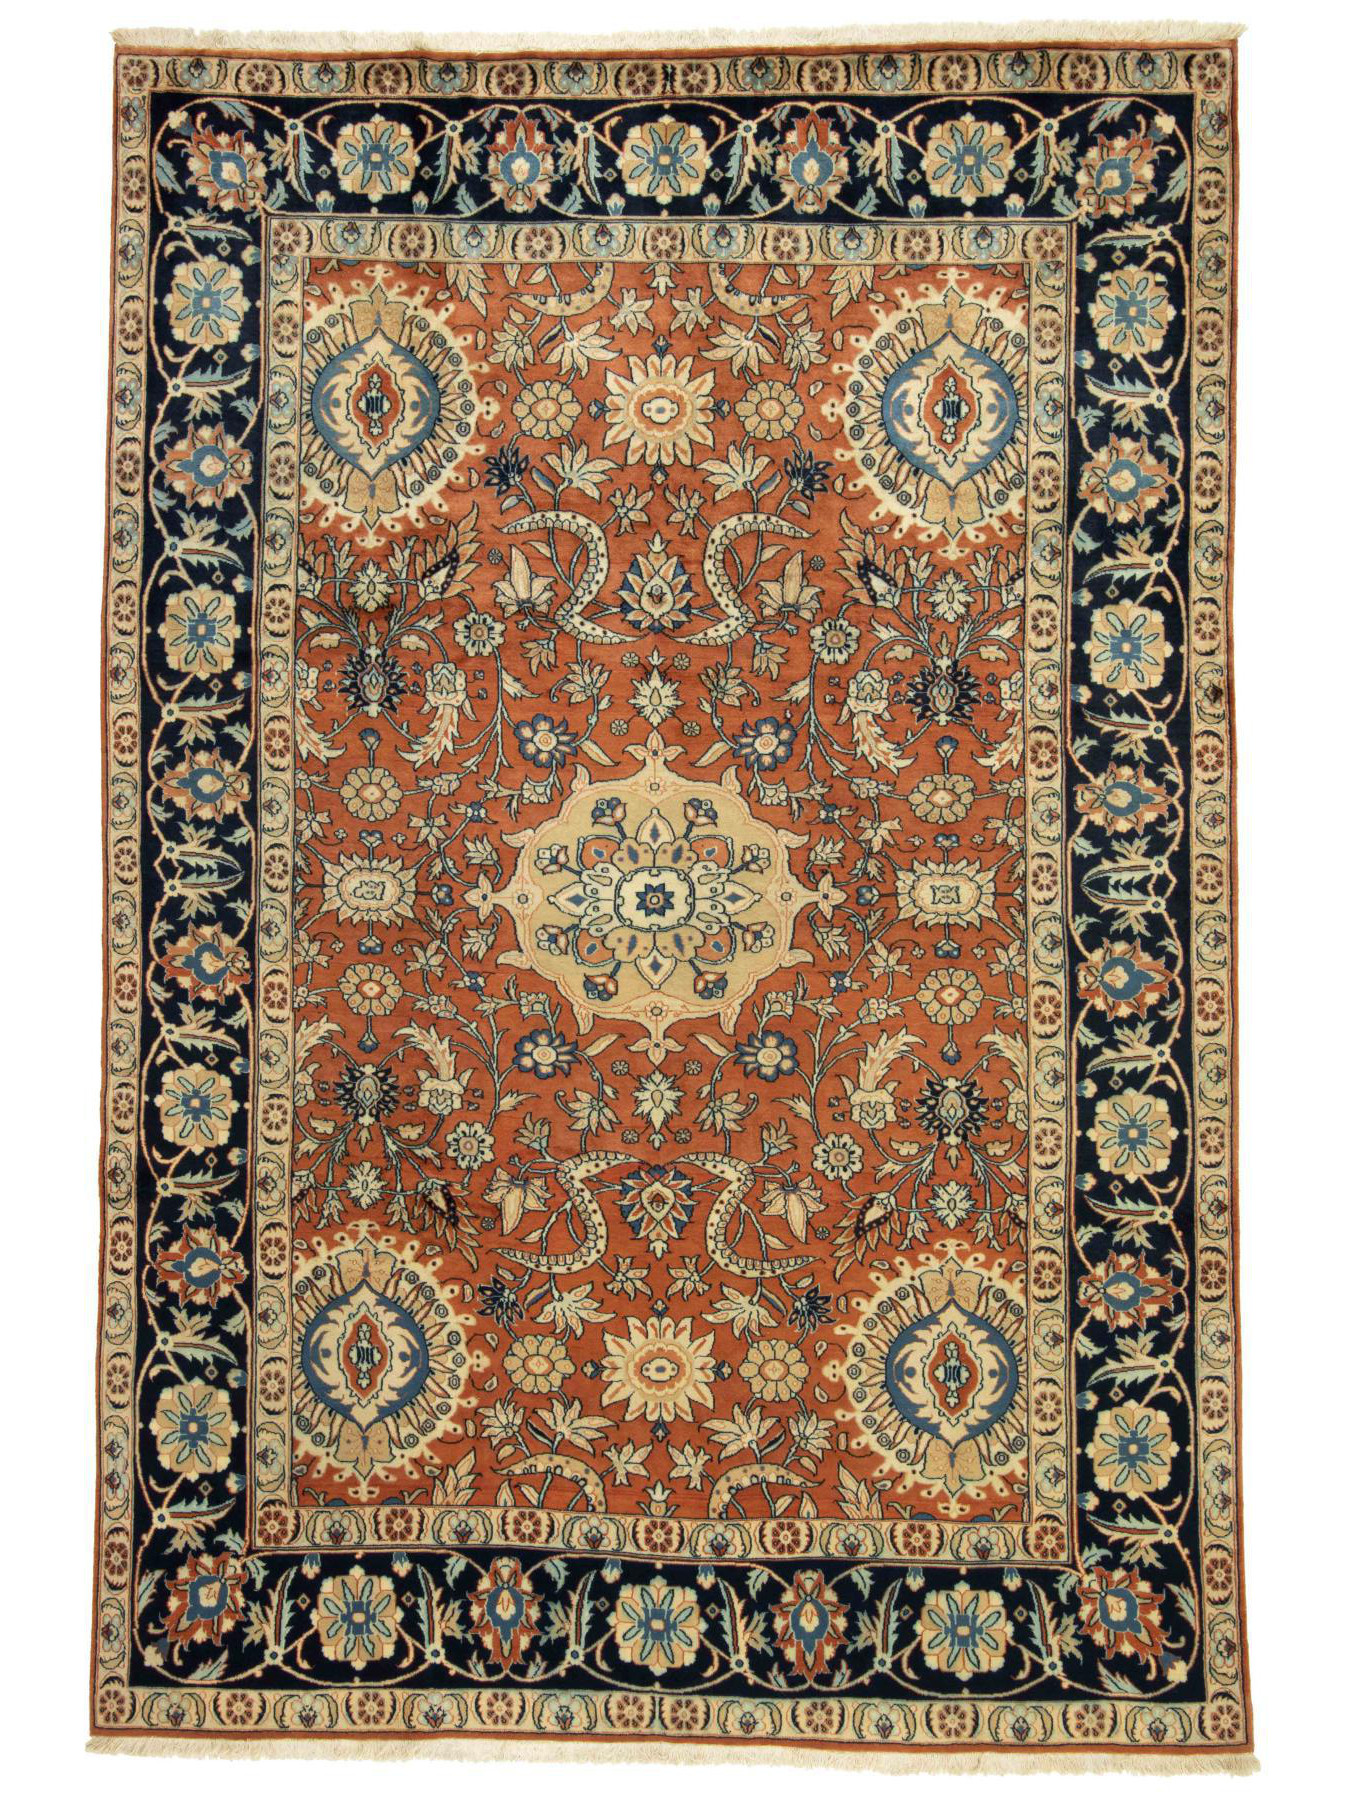 Perzische tapijten - Shahrbabak Sherkat